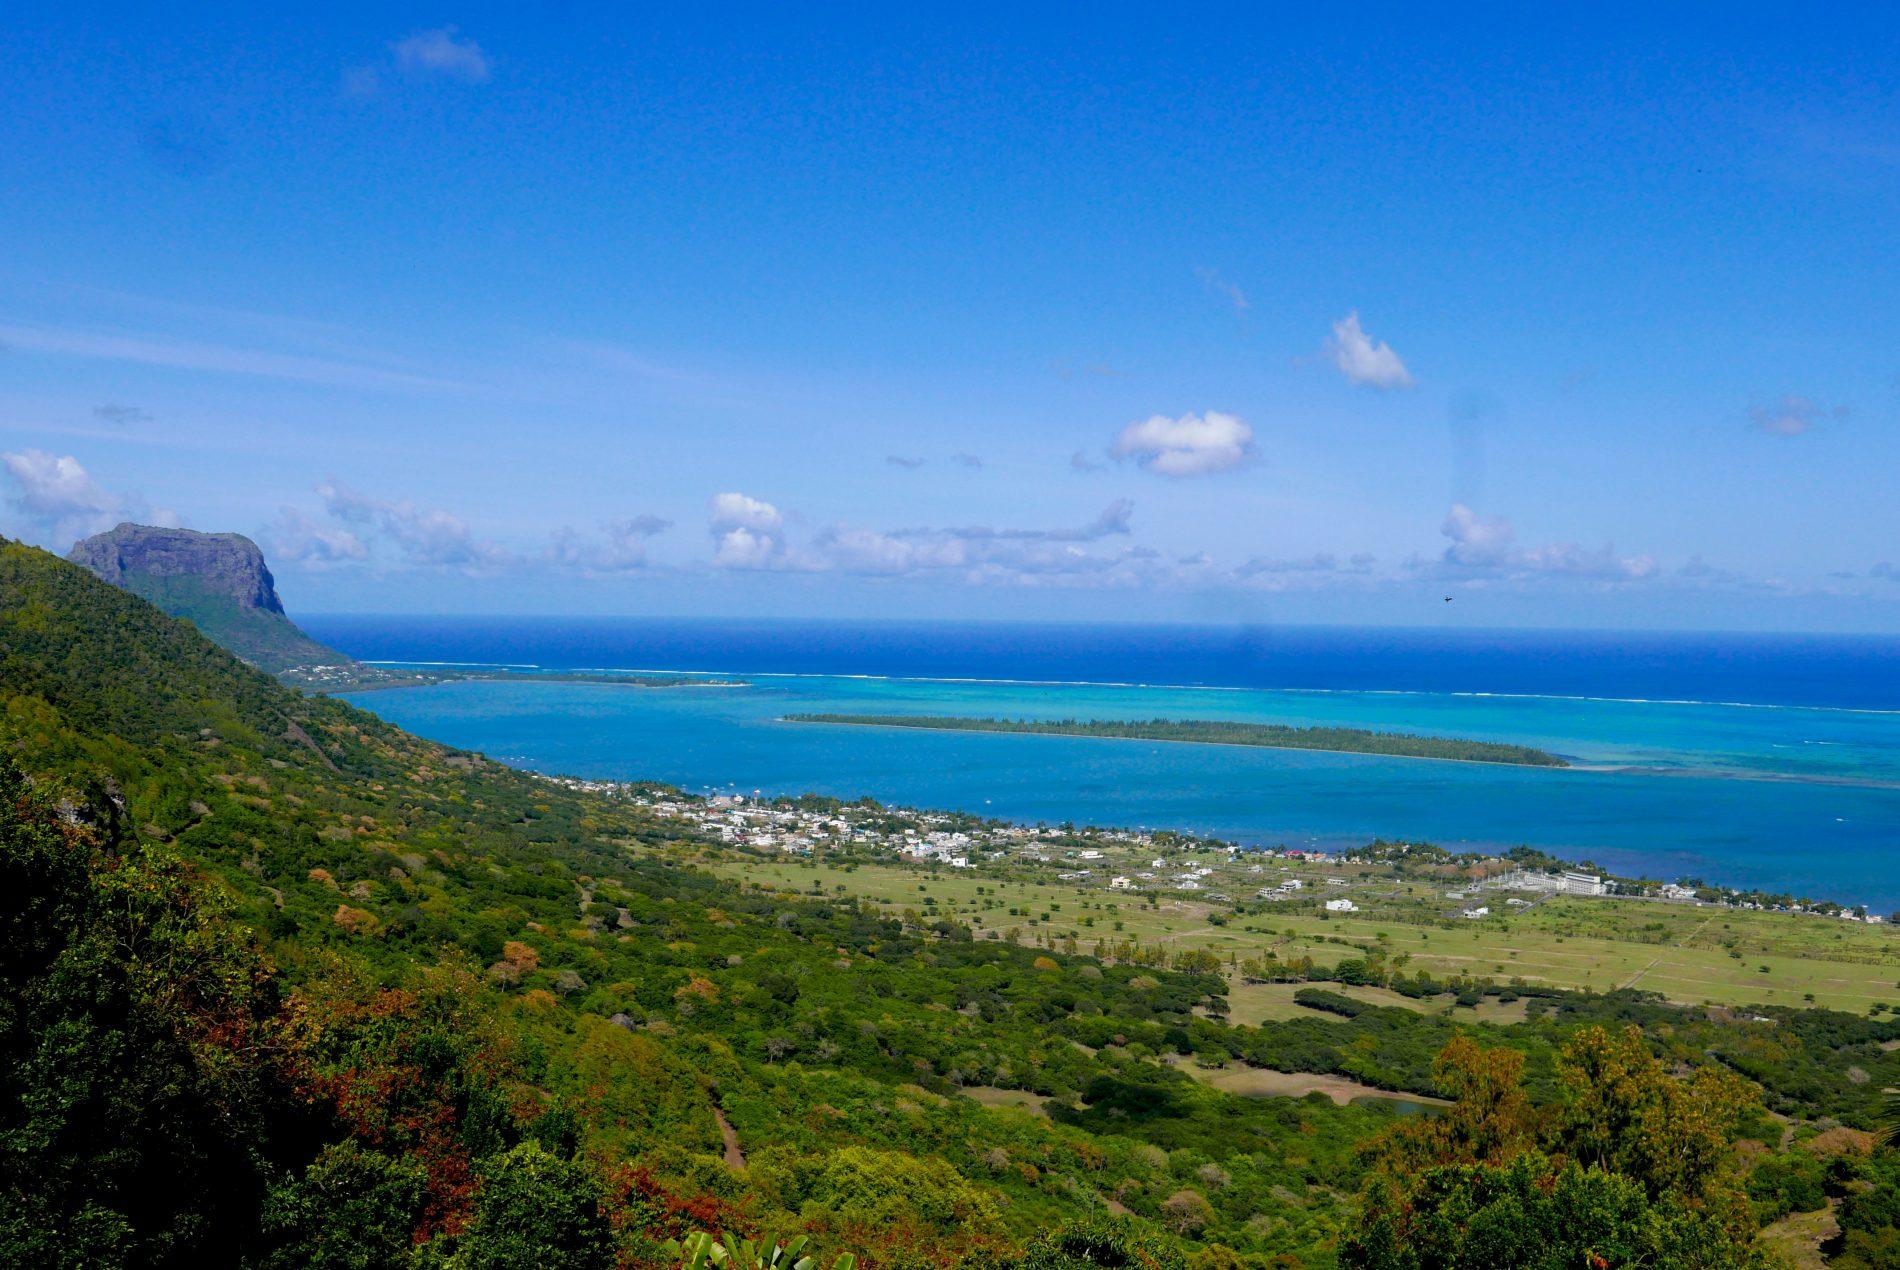 Do mirante de Chamarel é possível observar a barreira de coral que, no formato de um fino anel, circunda a principal ilha do arquipélago